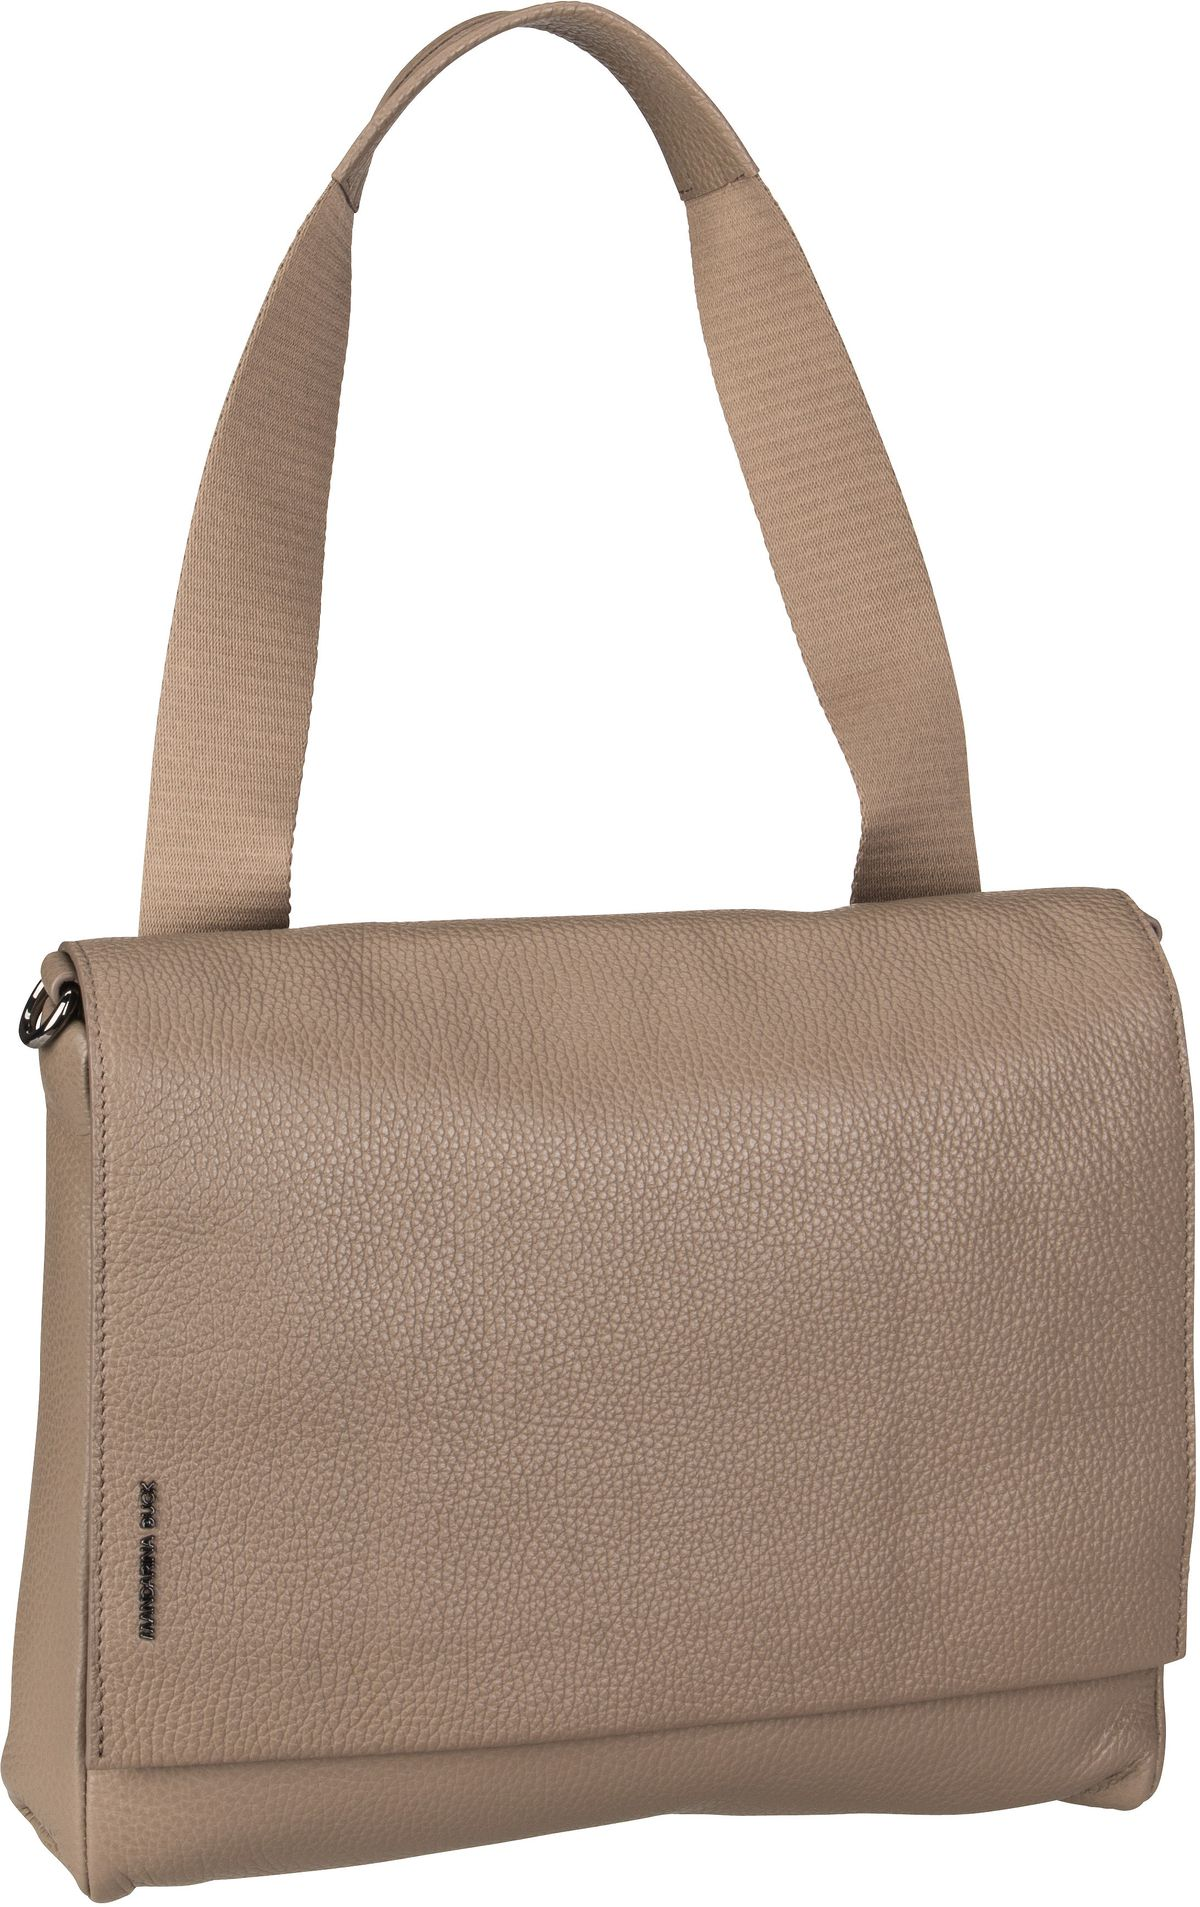 Handtasche Mellow Leather Crossover FZT97 Amphora